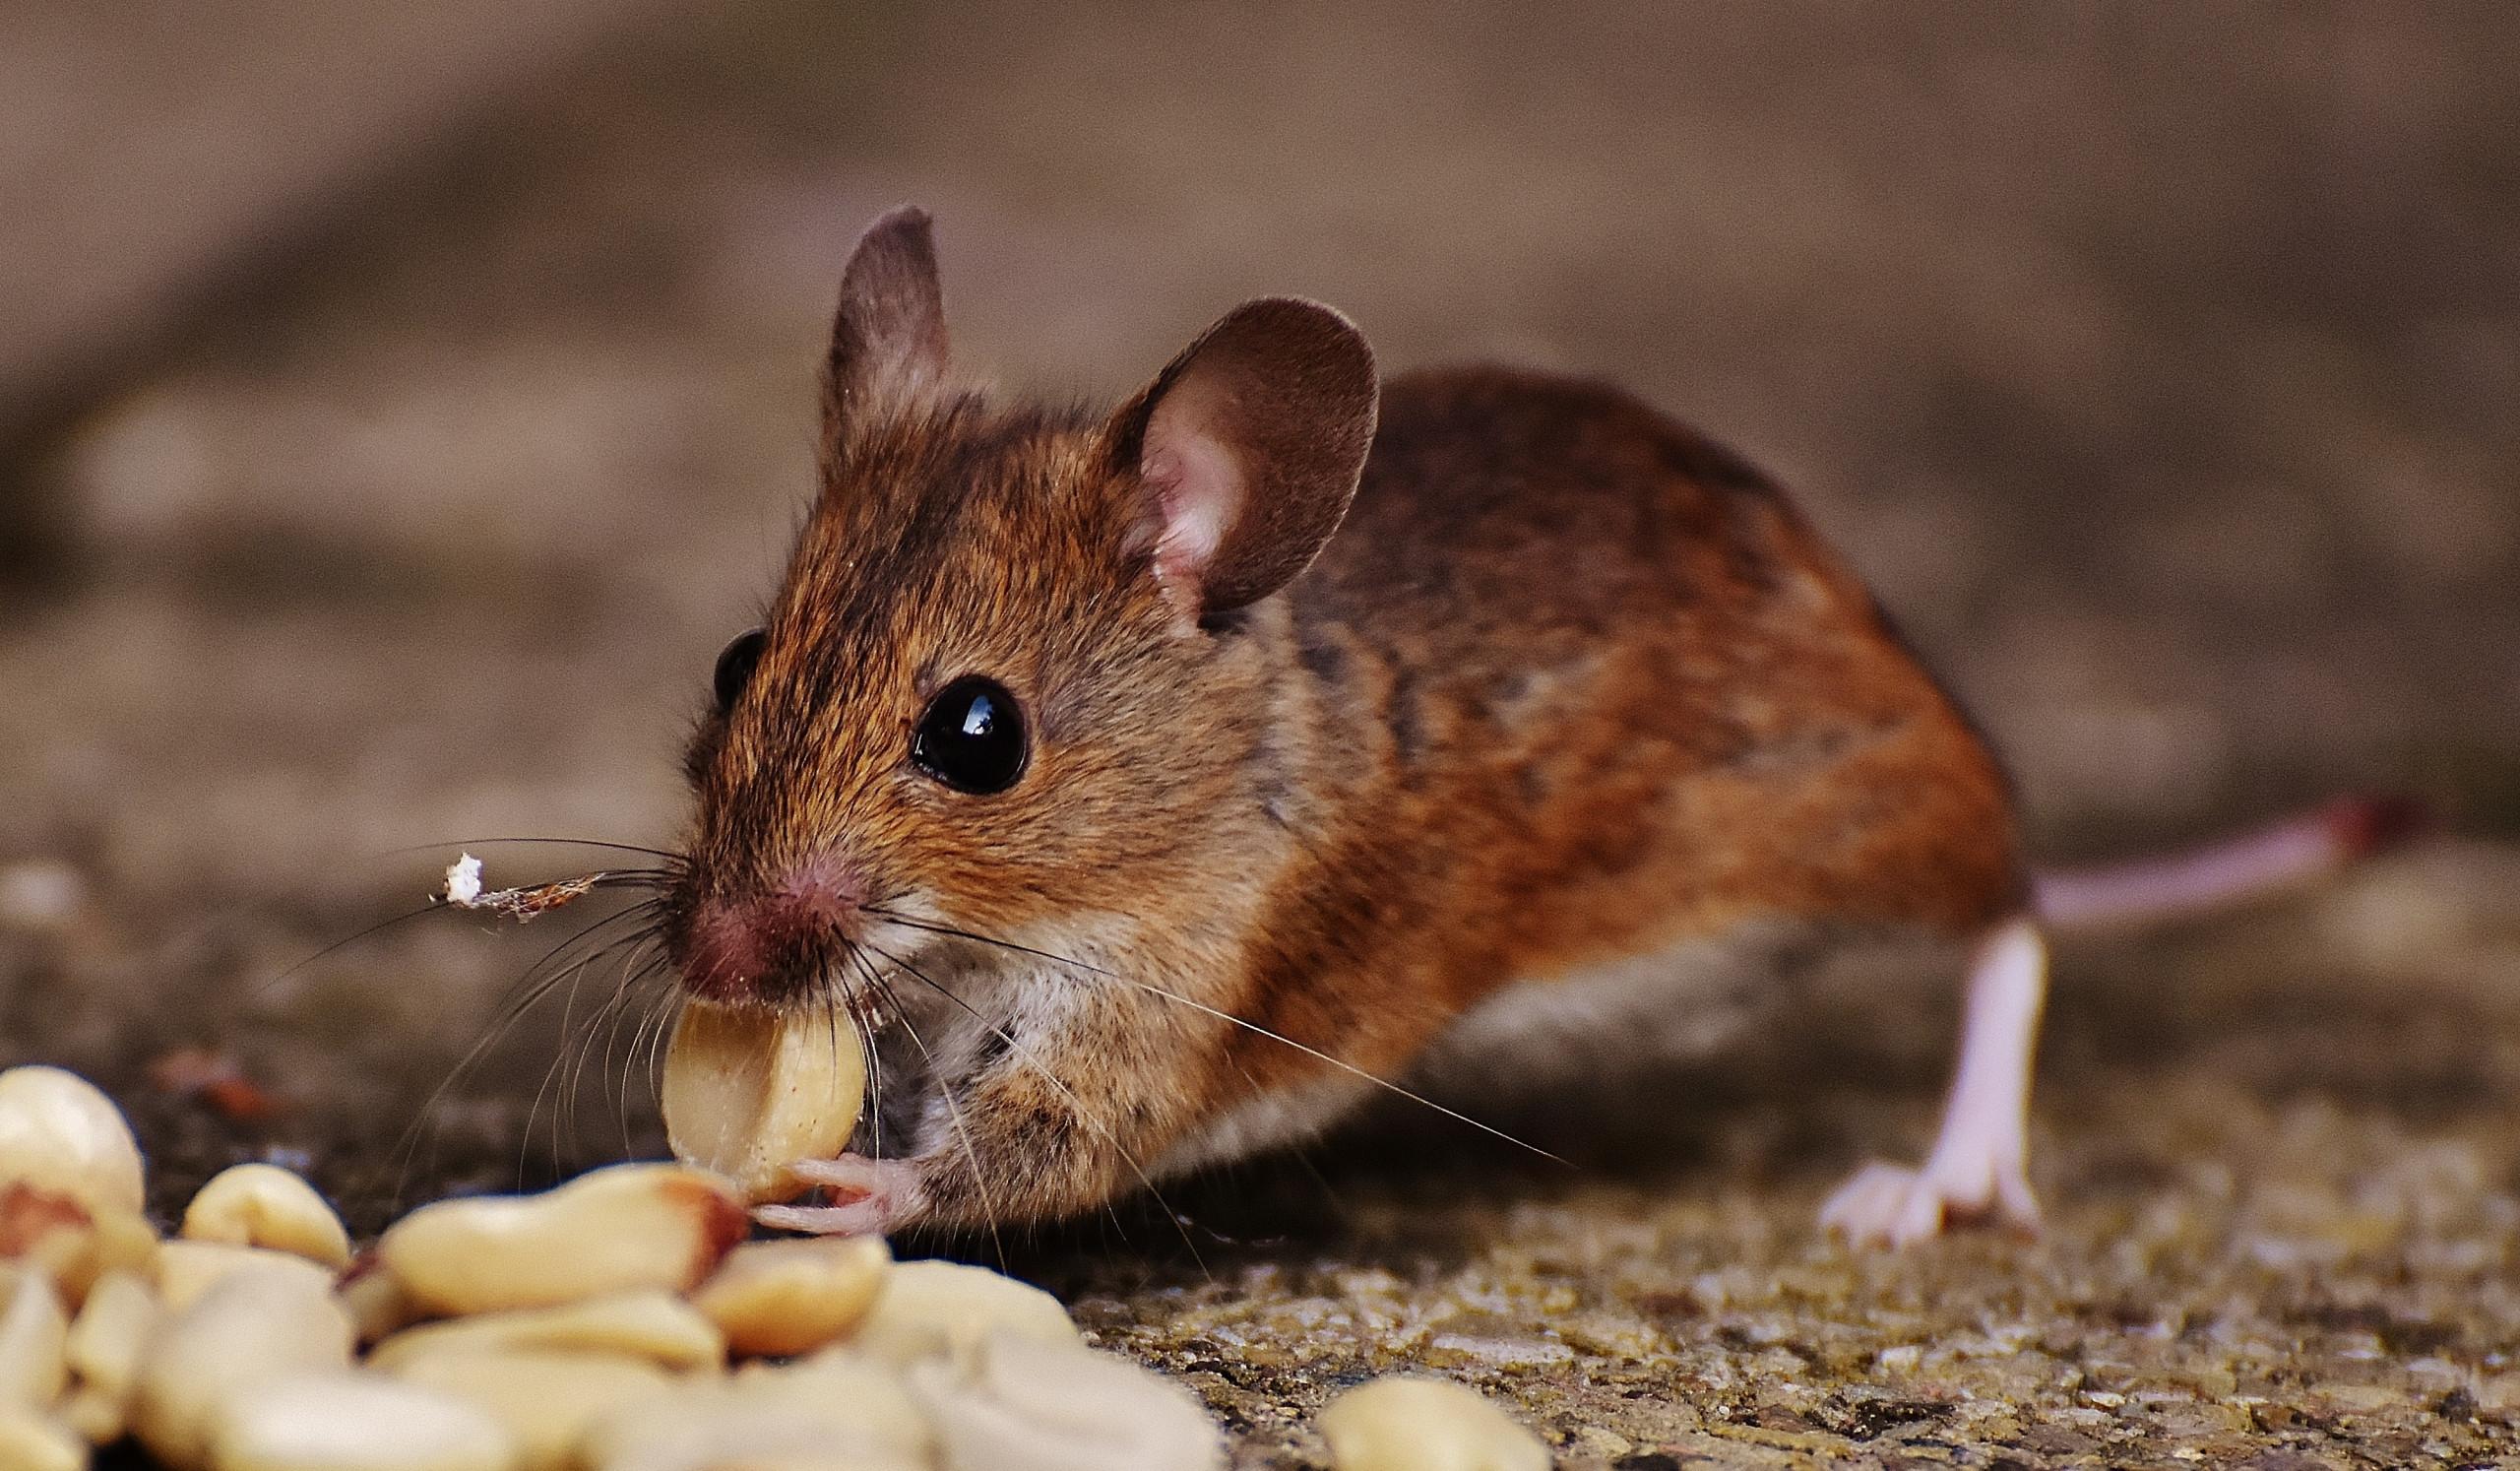 Plagas en casa: roedores